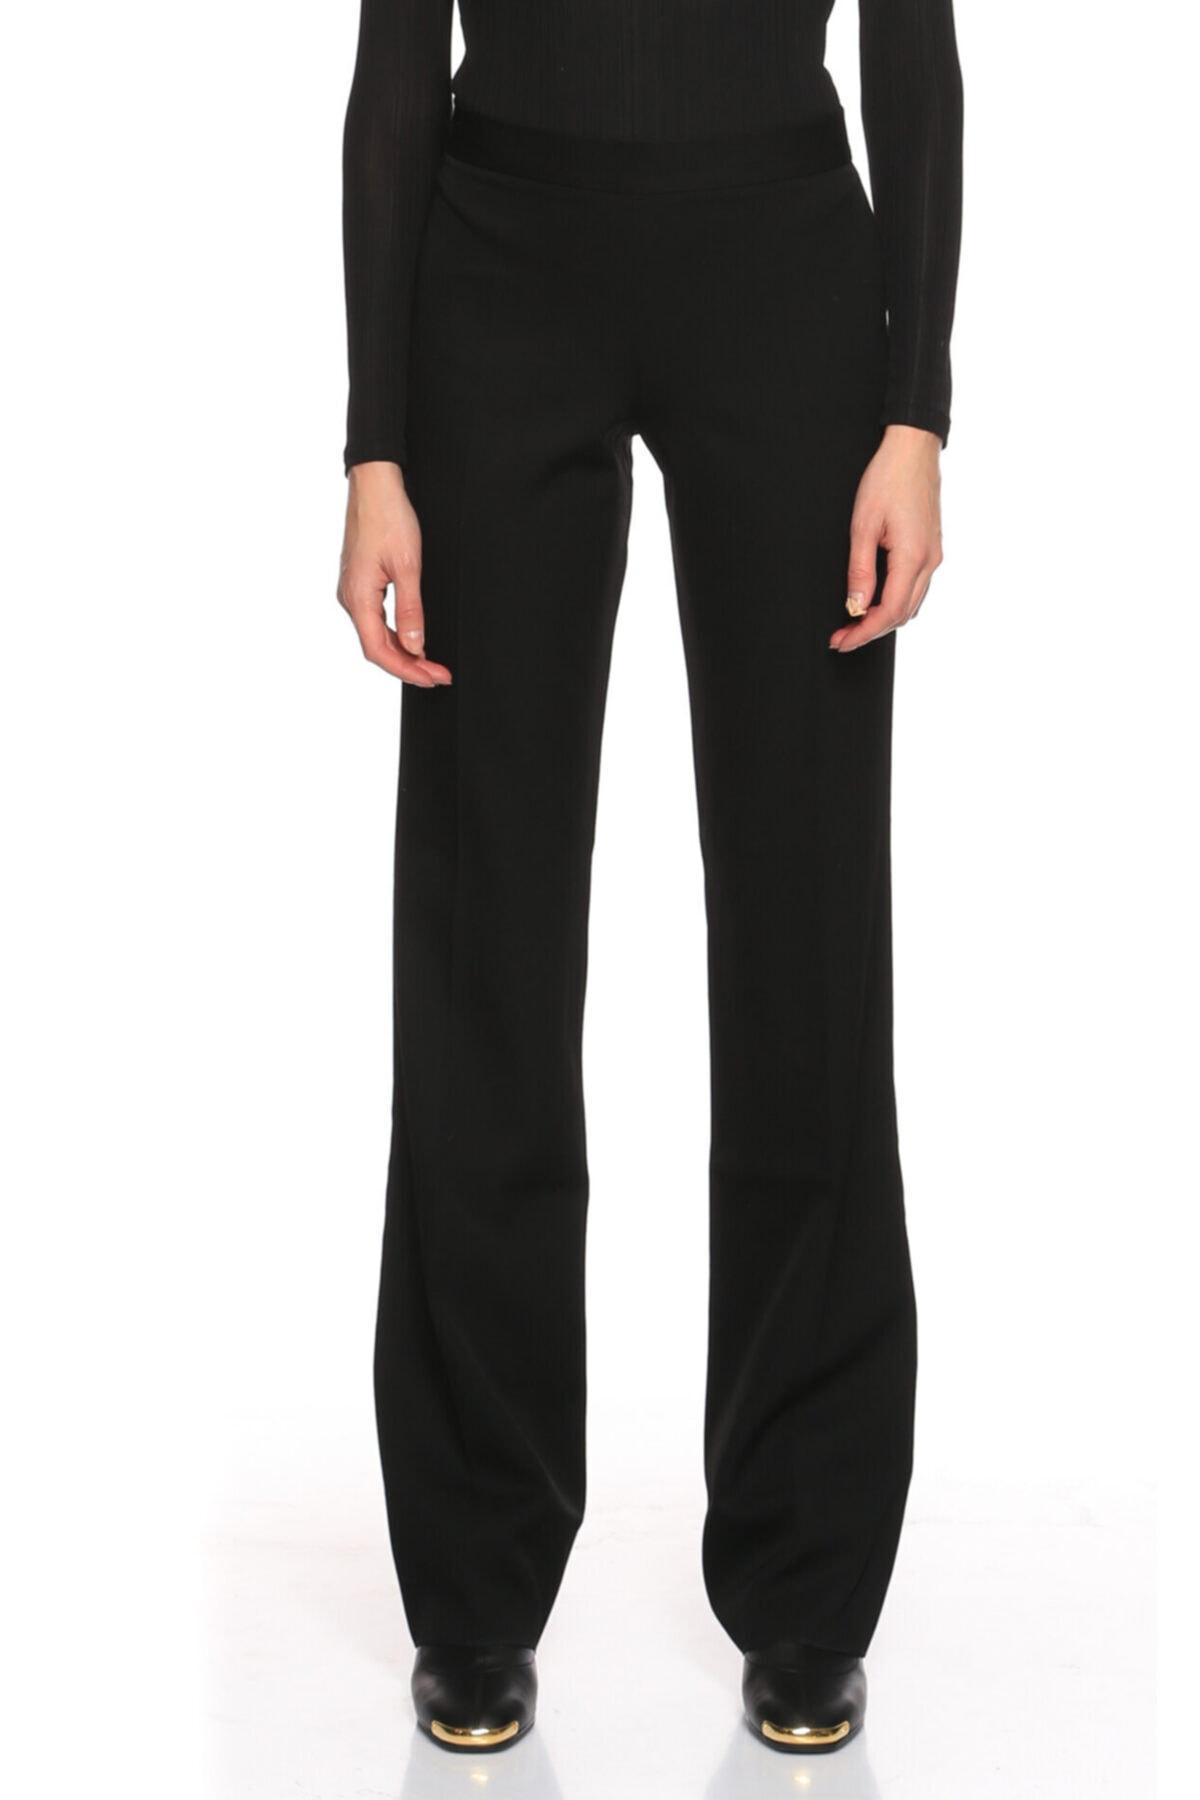 Gianfranco Ferre Cepsiz Siyah Pantolon 1